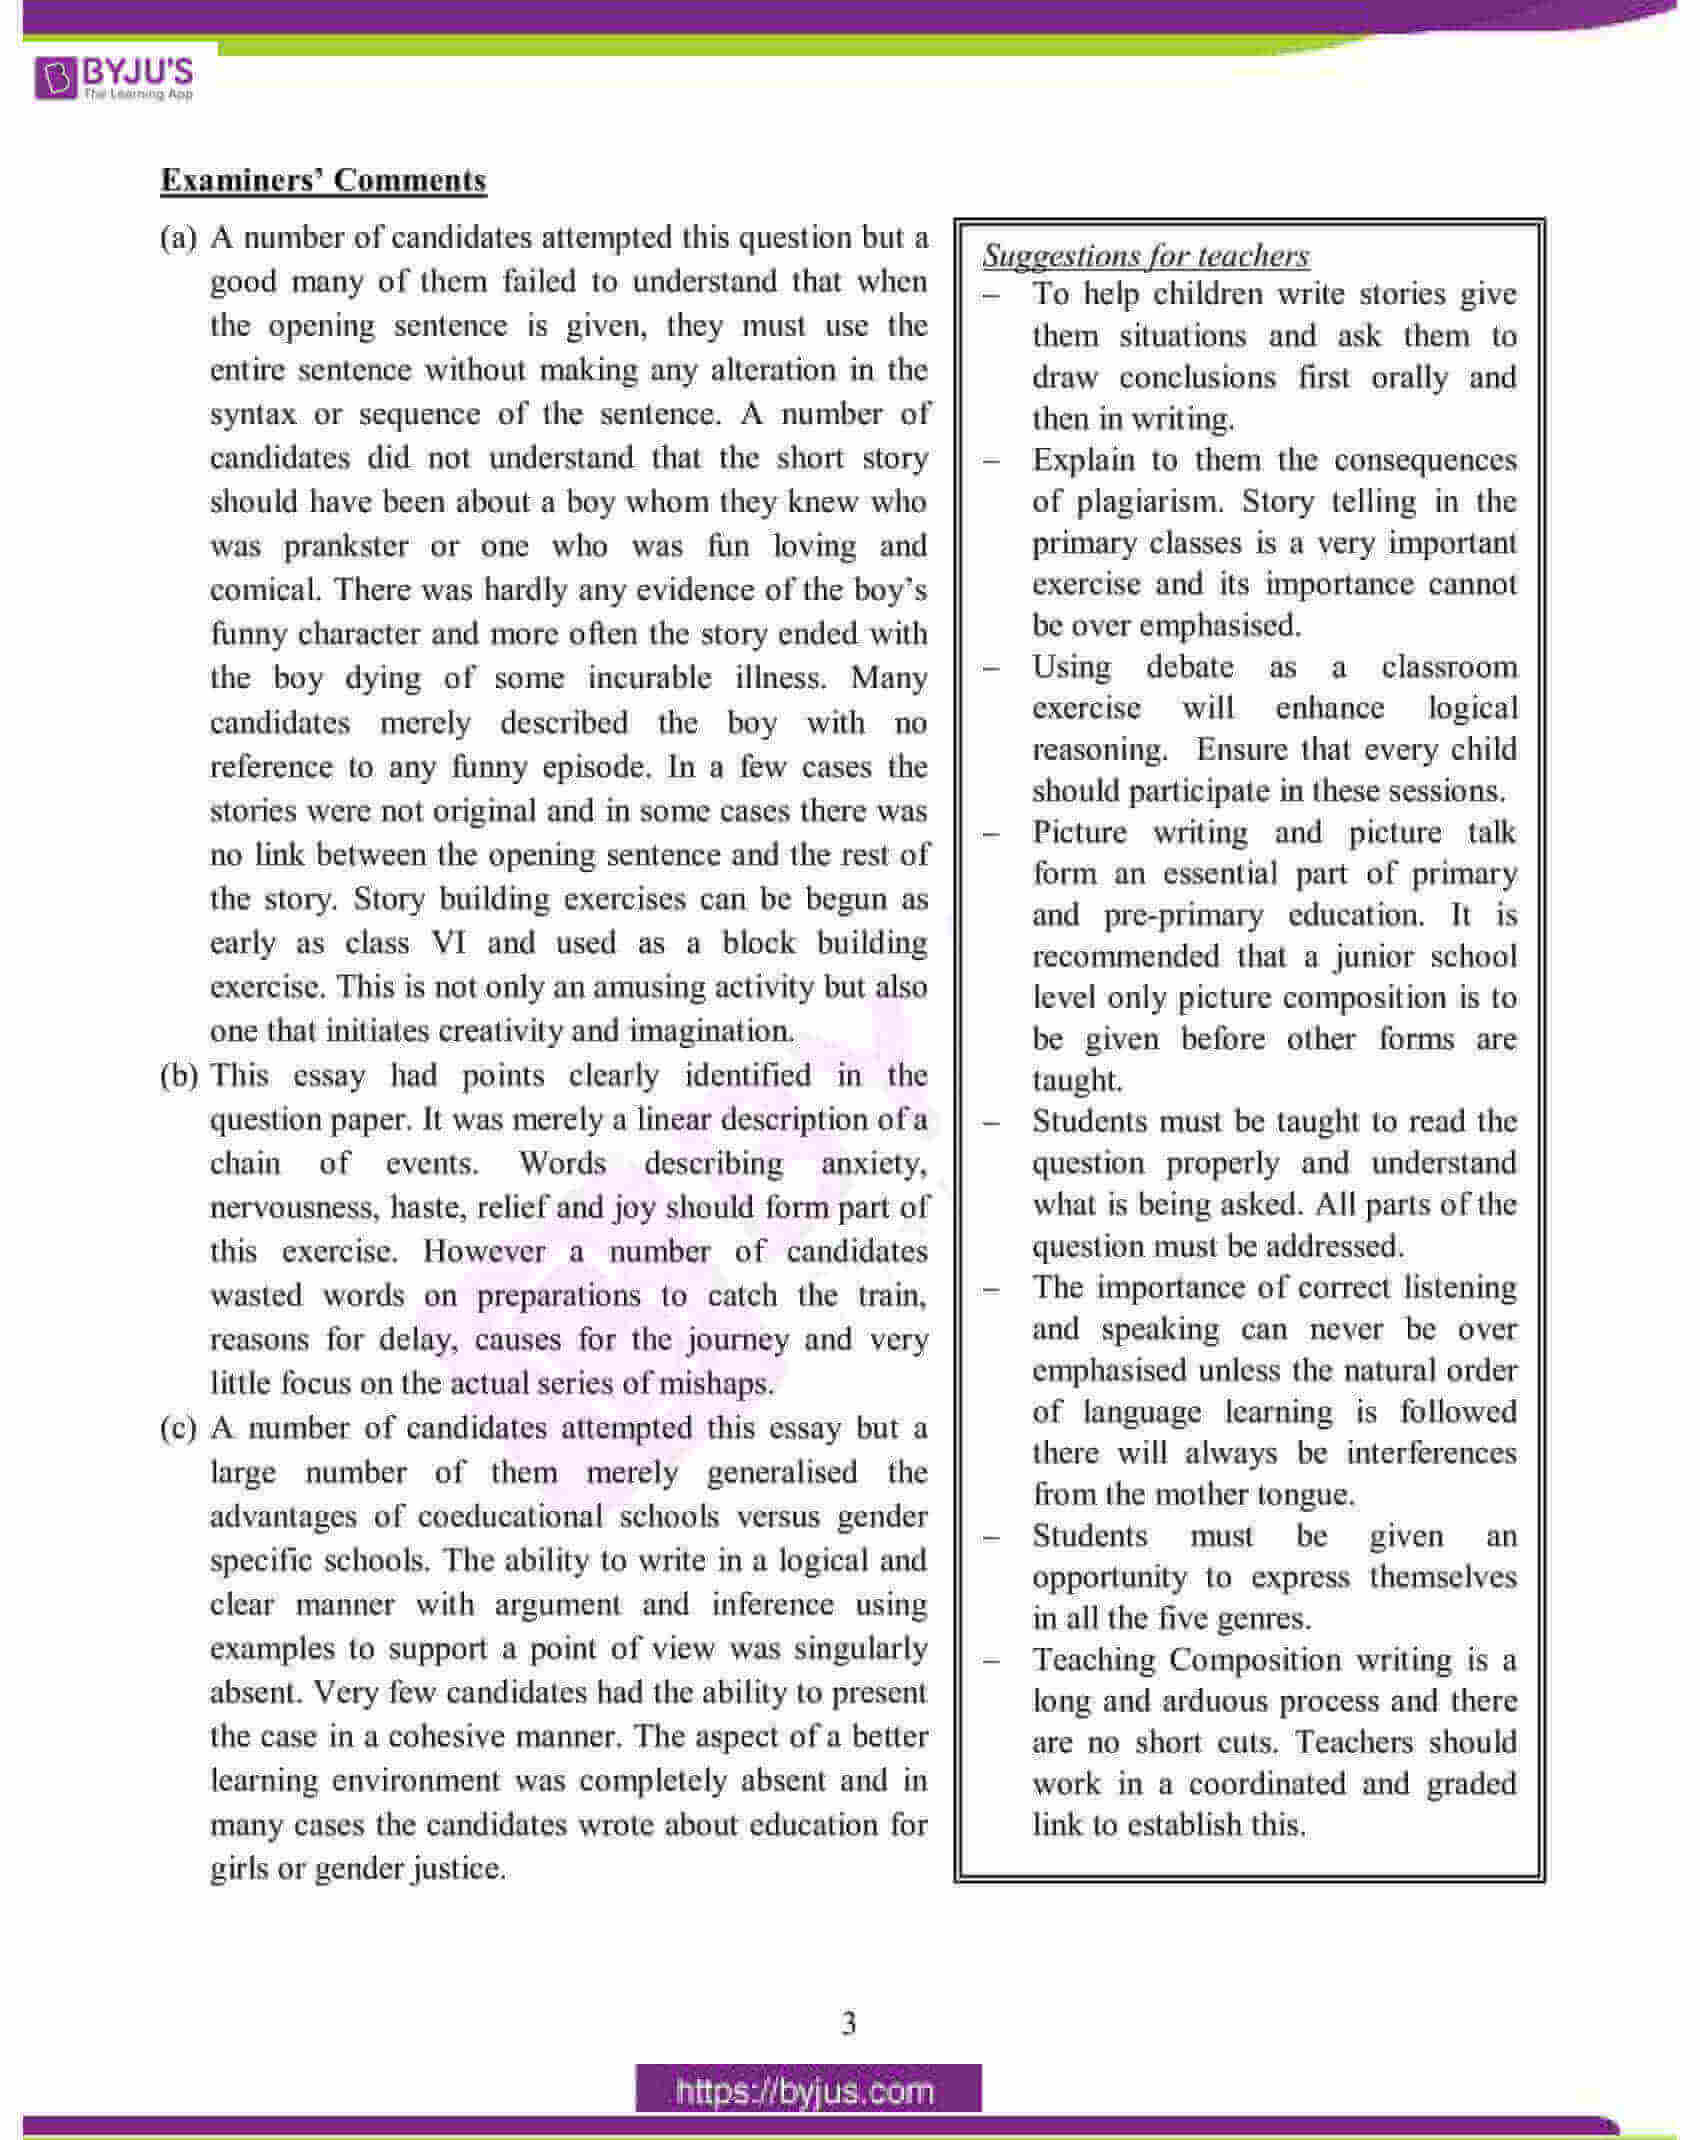 icse class 10 eng lan question paper solution 2015 02